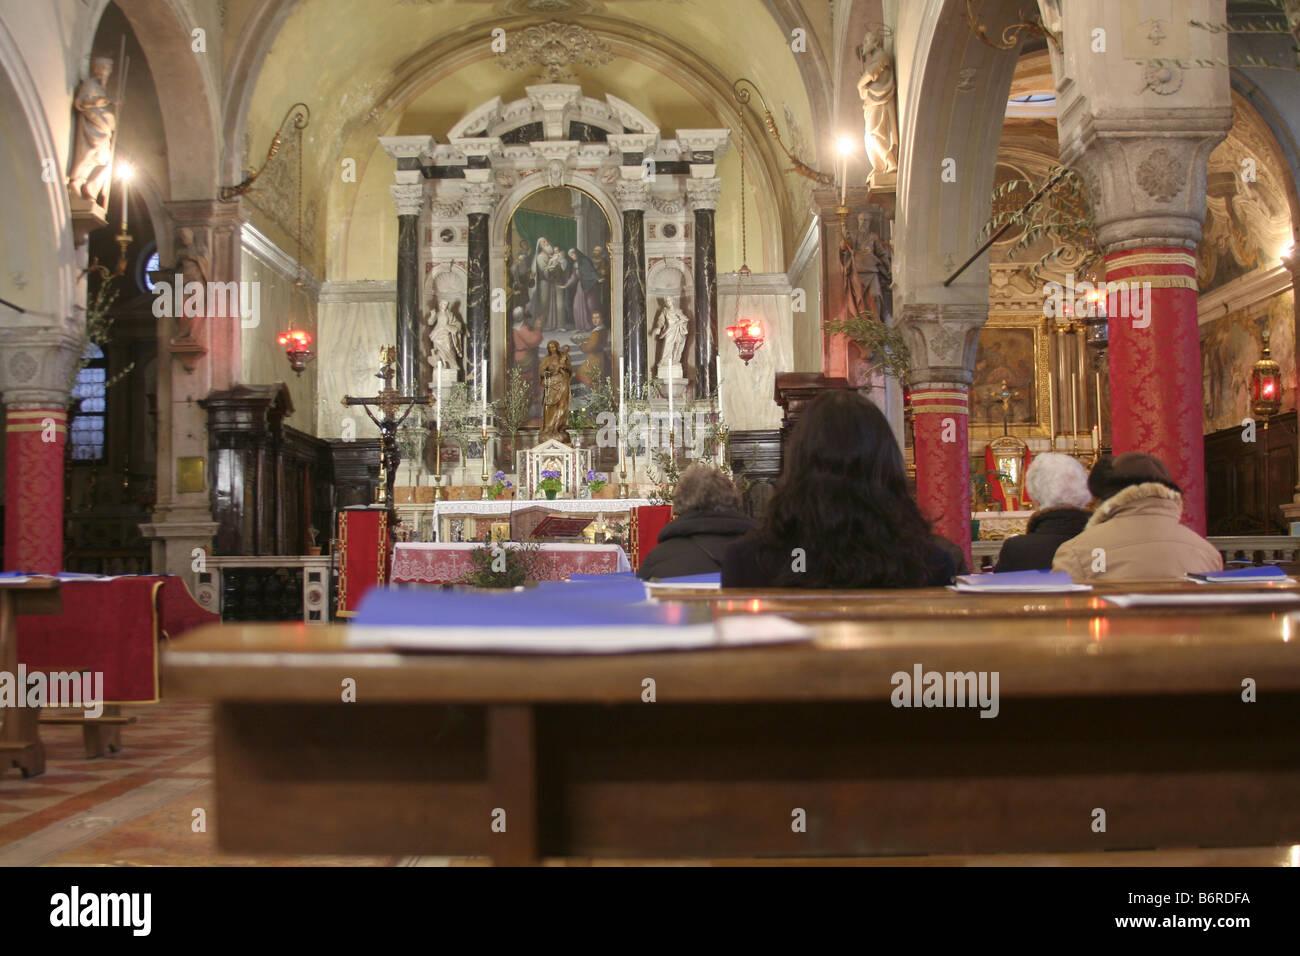 Four women in Catholic church in Venice, Italy - Stock Image